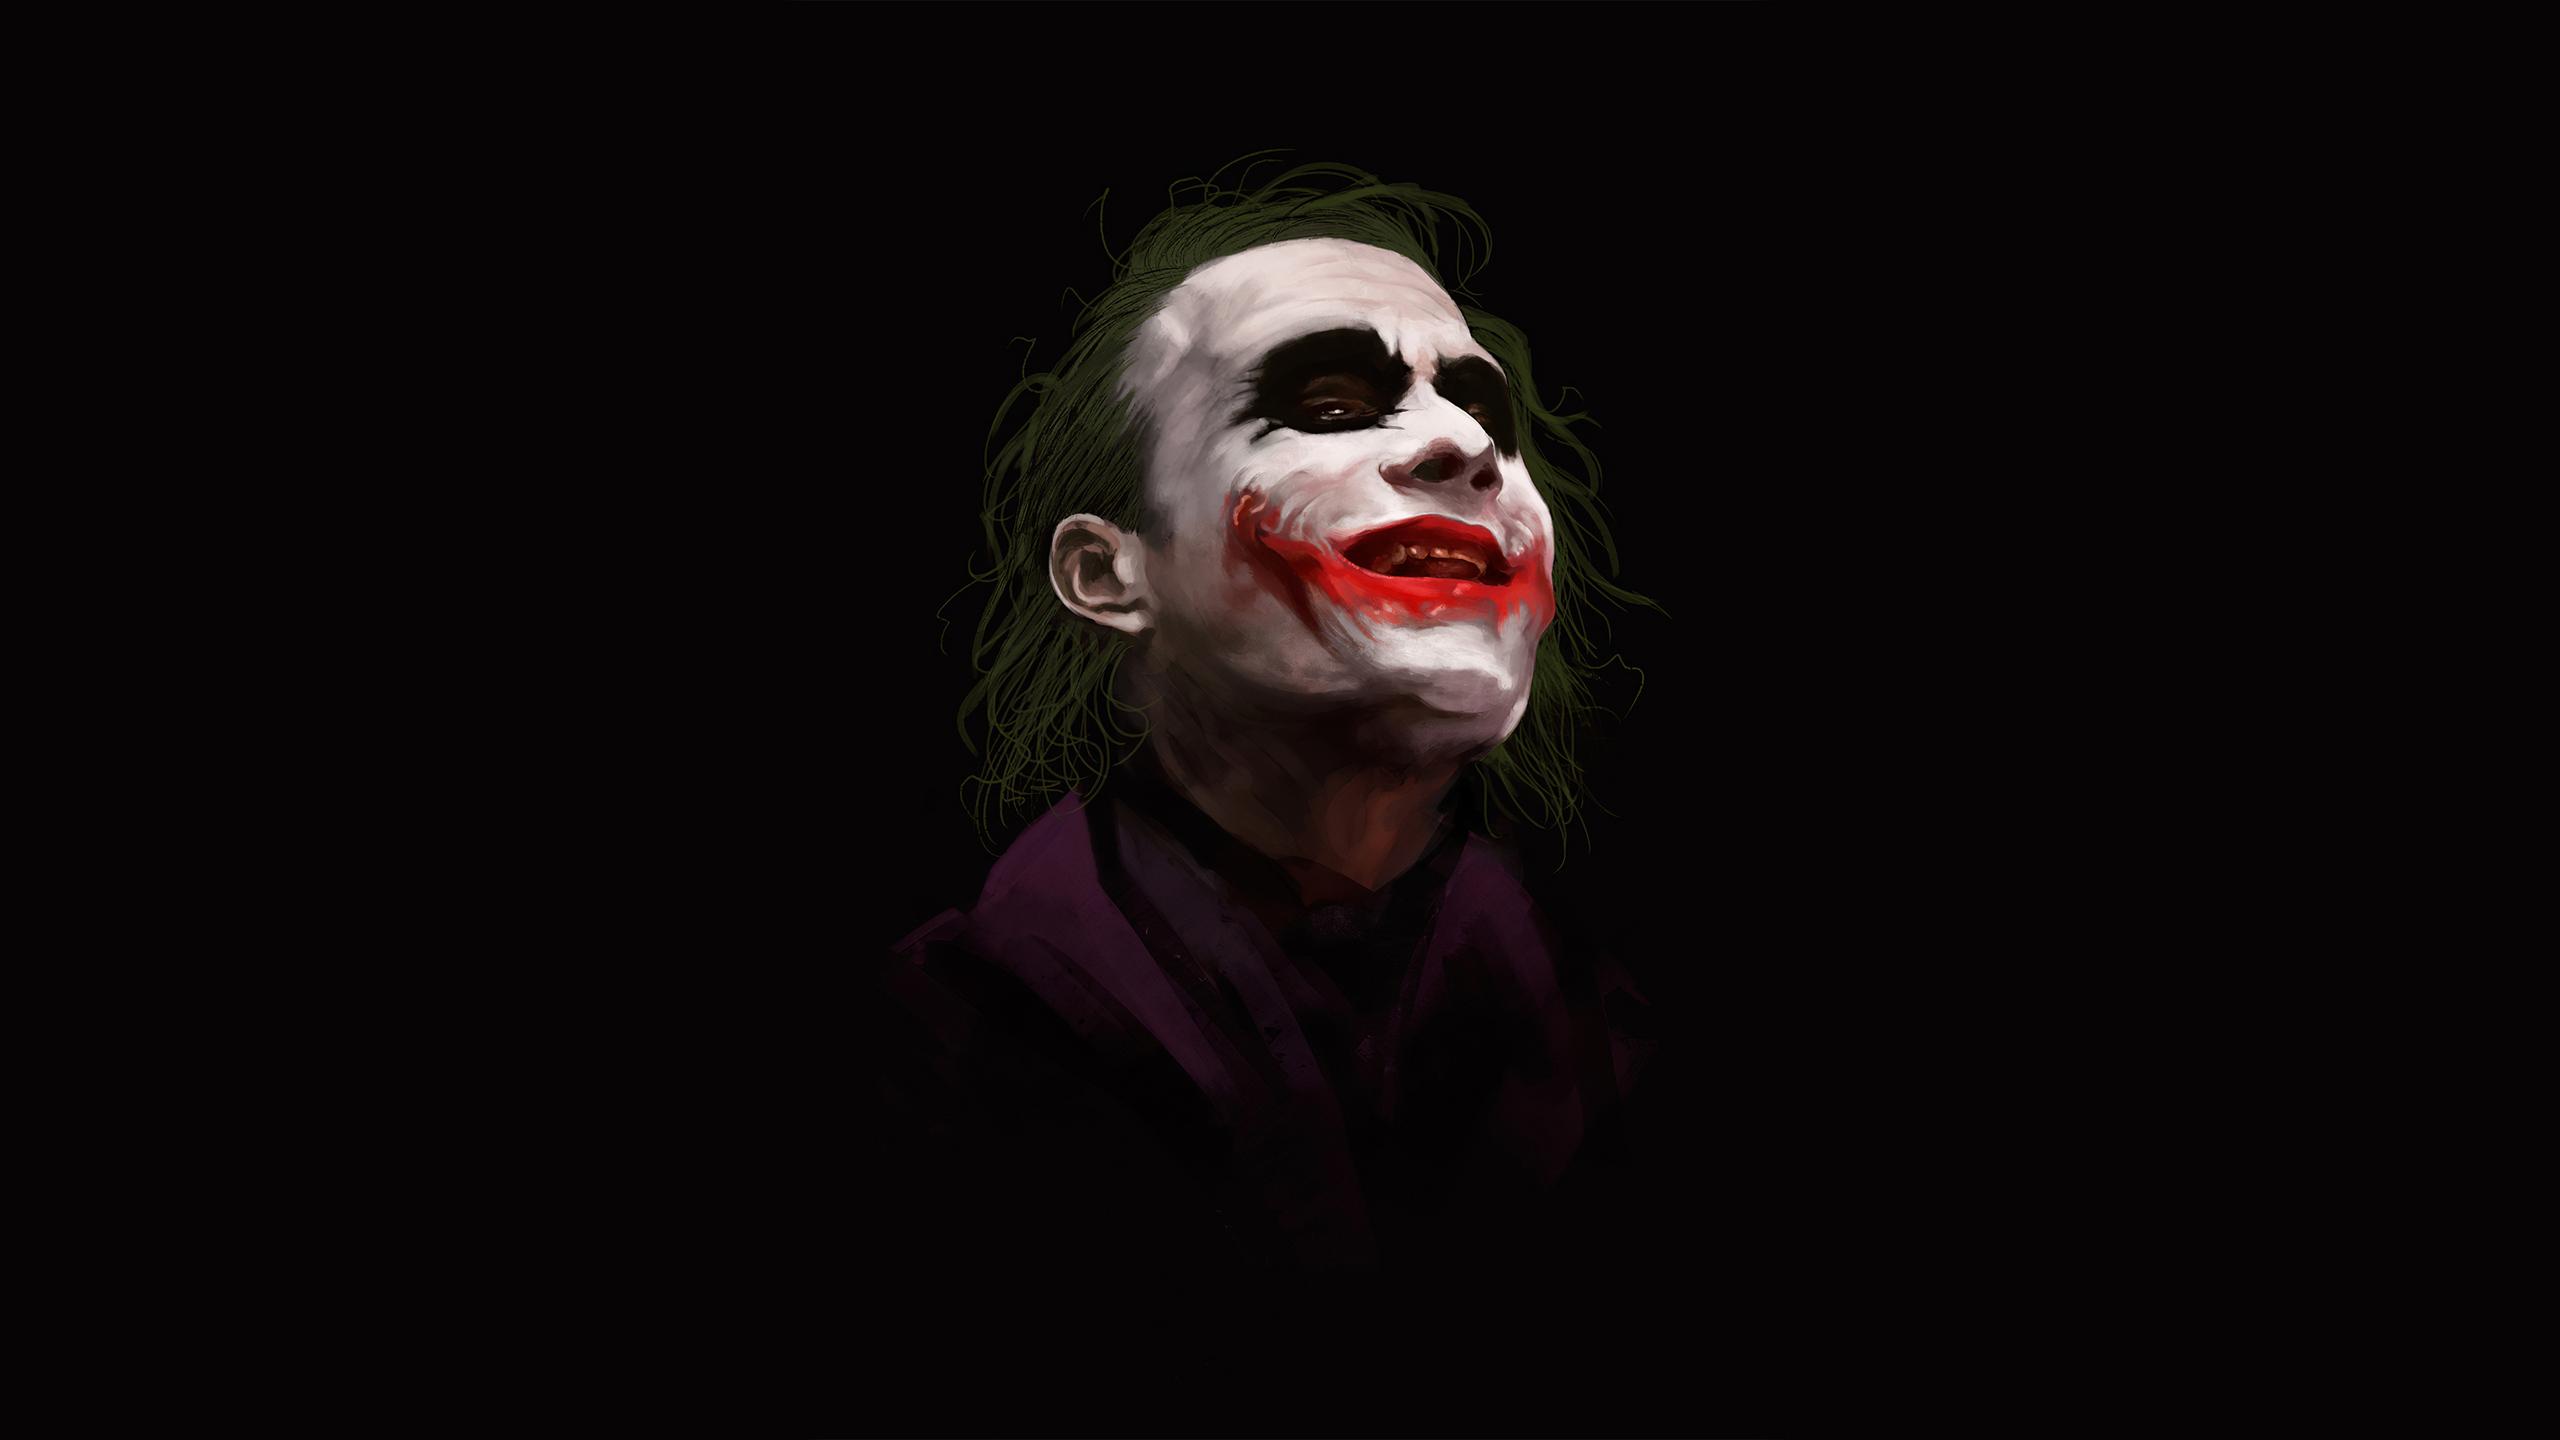 2560x1440 Heath Ledger Laugh 1440P Resolution HD 4k ...